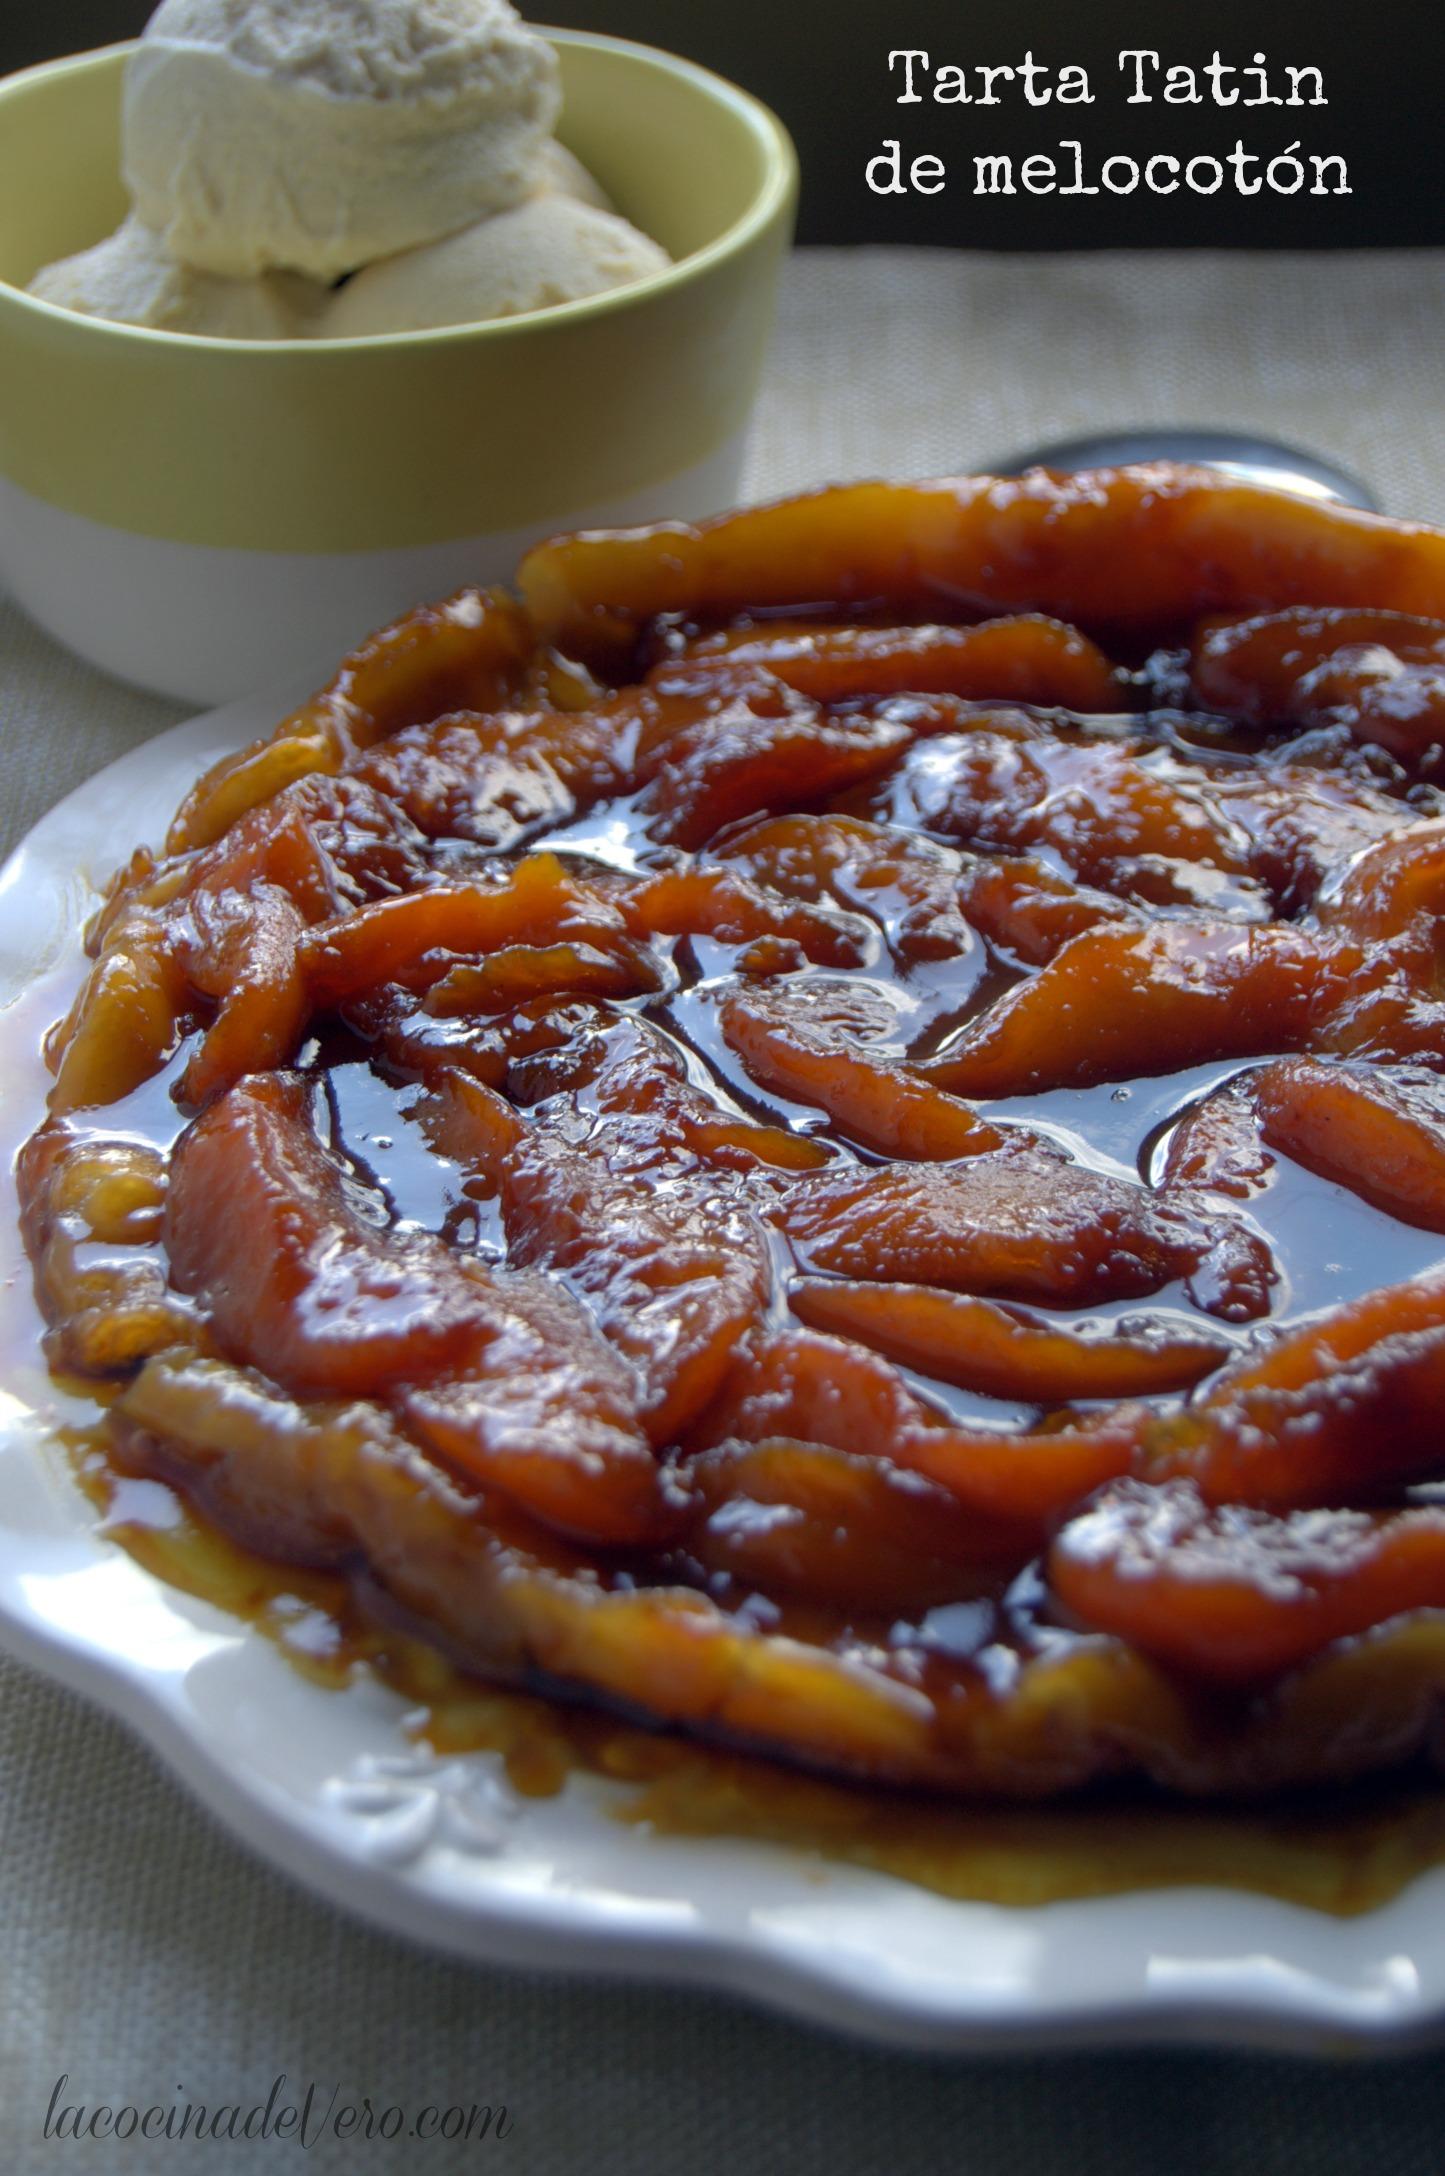 Tarta Tatin C Cocina | Tarta Tatin De Melocoton Peach Tatin Tart